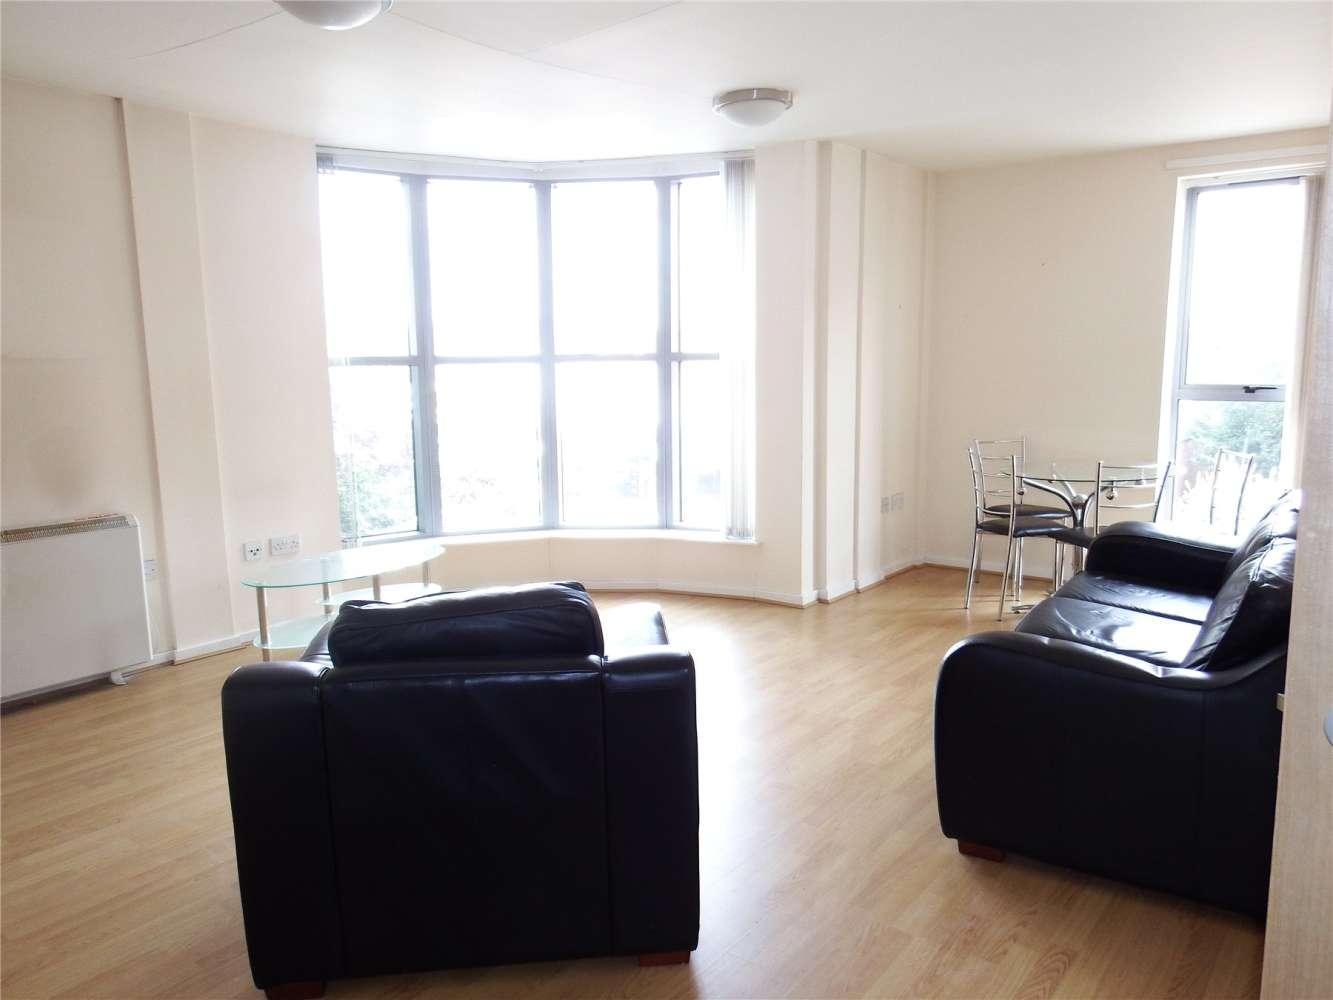 Apartment Leeds, LS2 - Ahlux Court Millwright Street Leeds West Yorkshire - 06